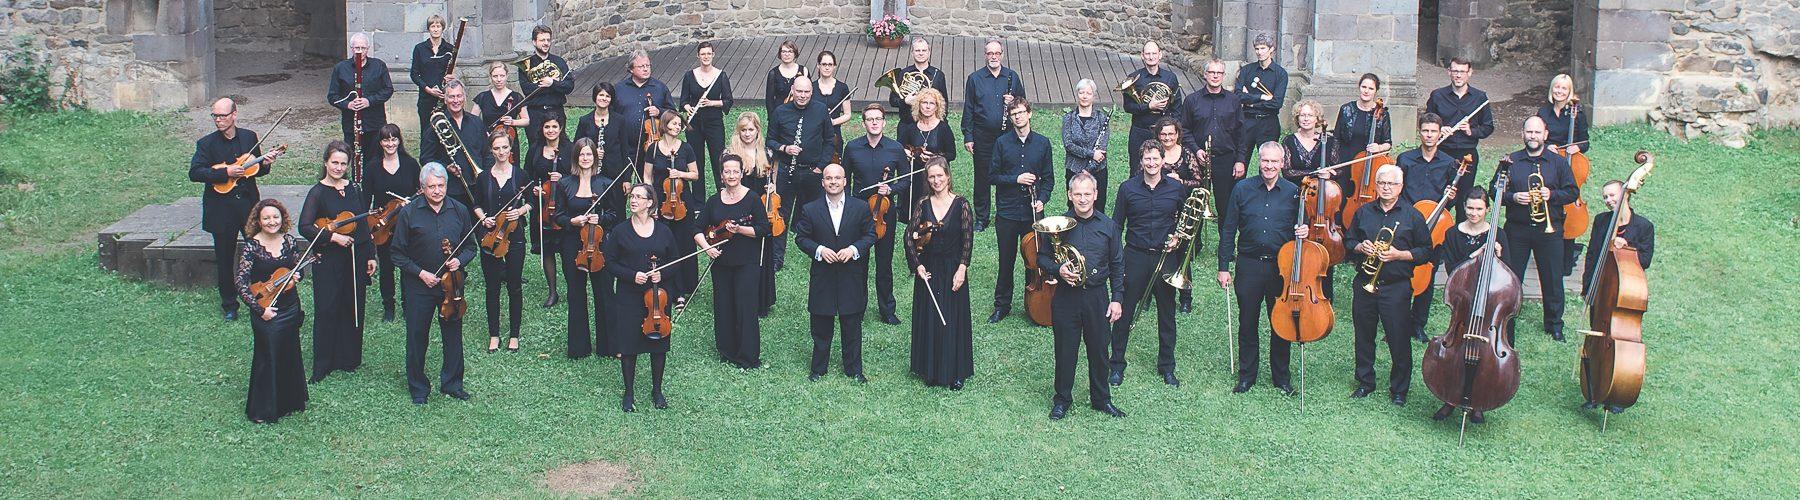 German Rhine Philharmonic